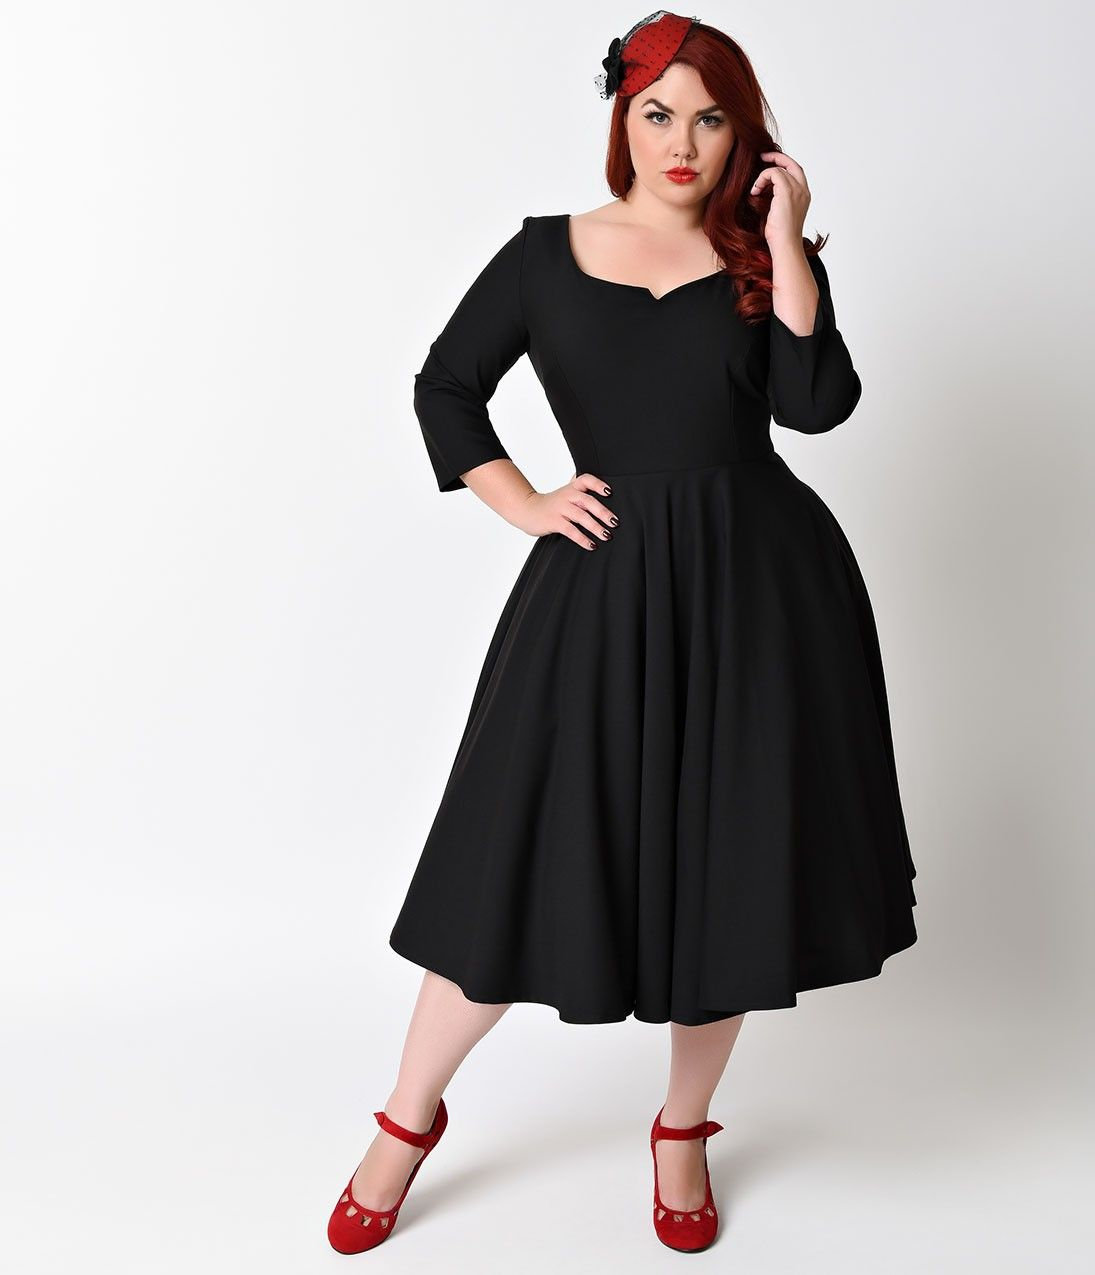 Vintage kleider große größe  Vintage kleider, Kleider, Kleidung